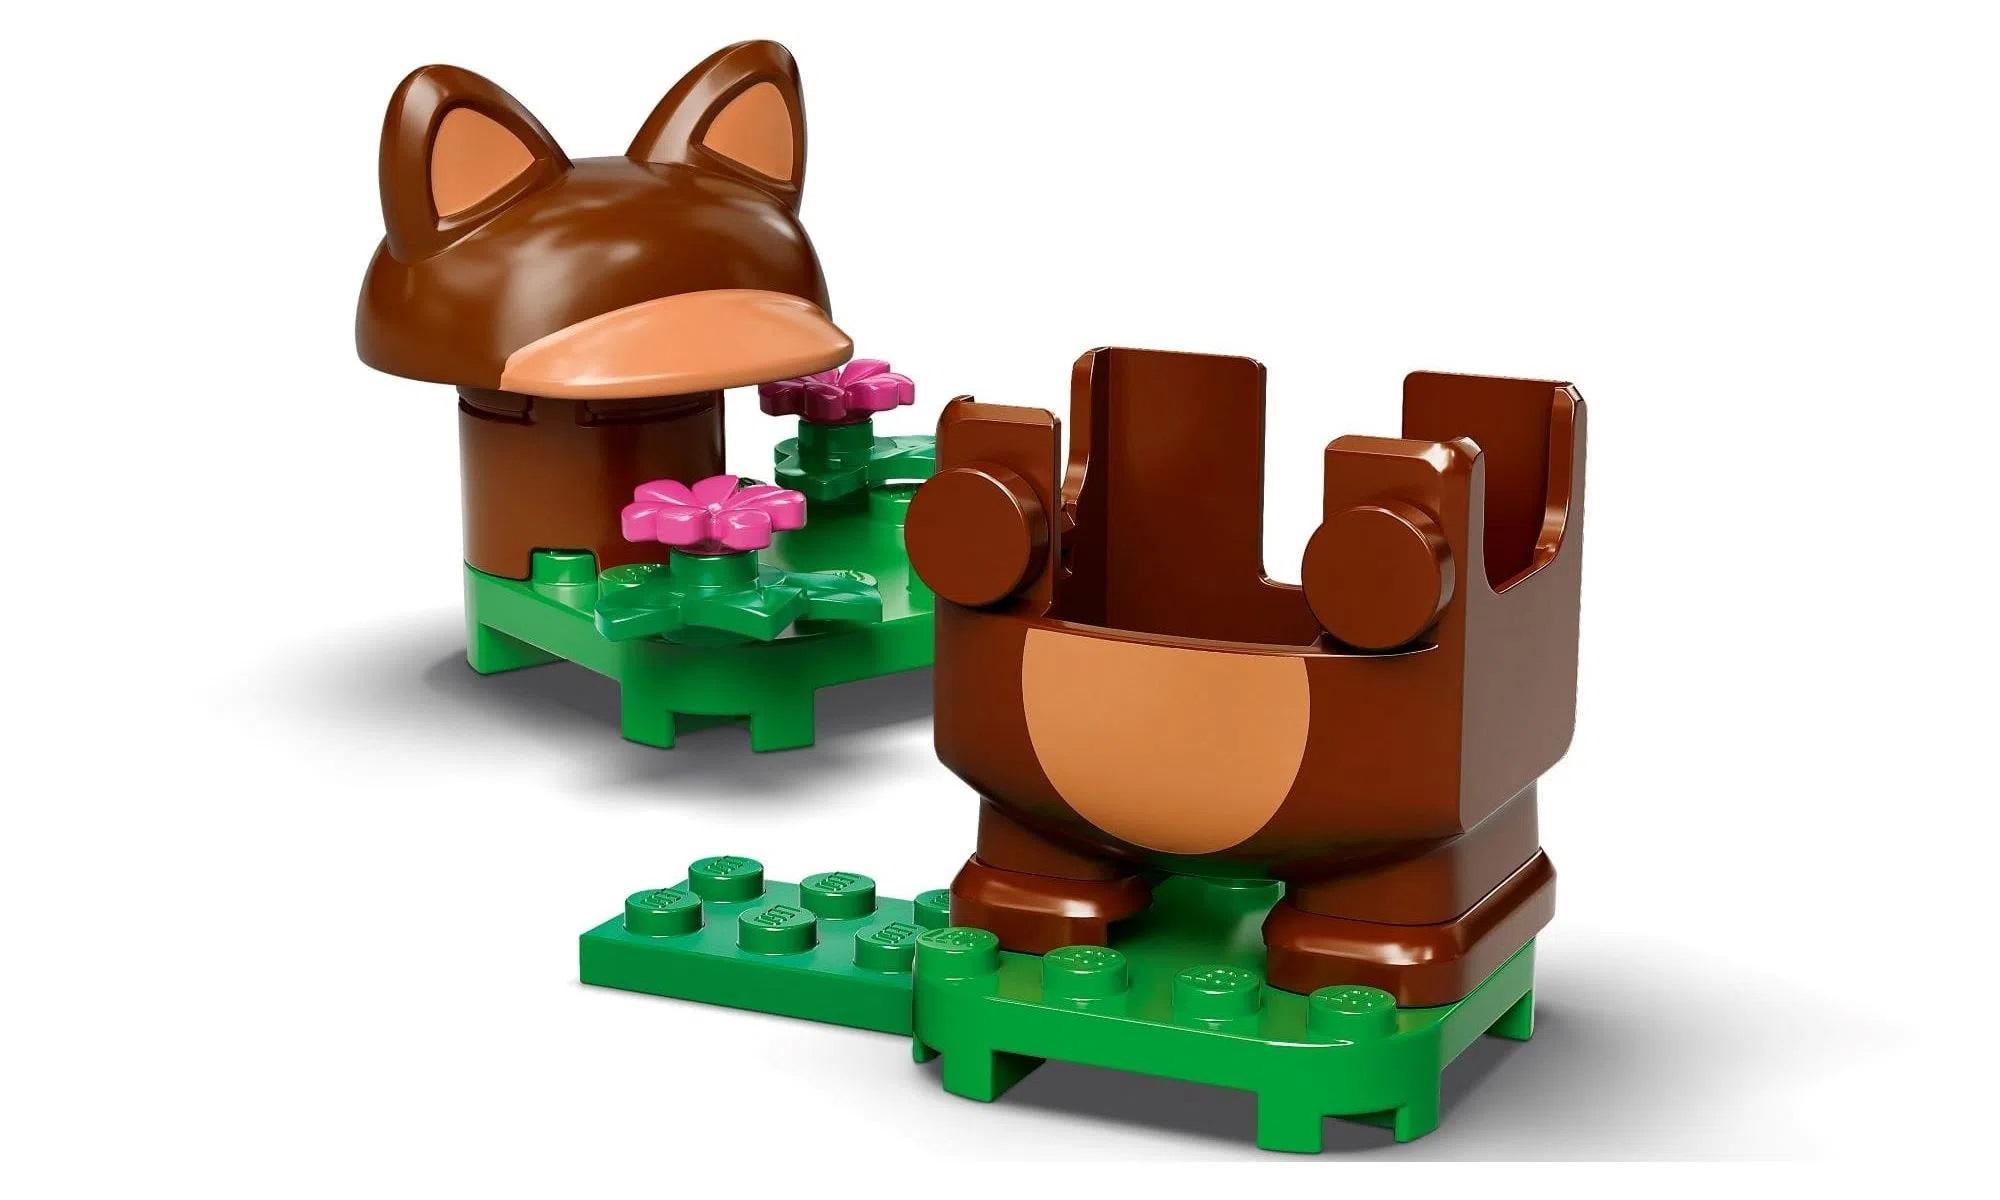 LEGO Super Mario Tanooki Power Up 71385